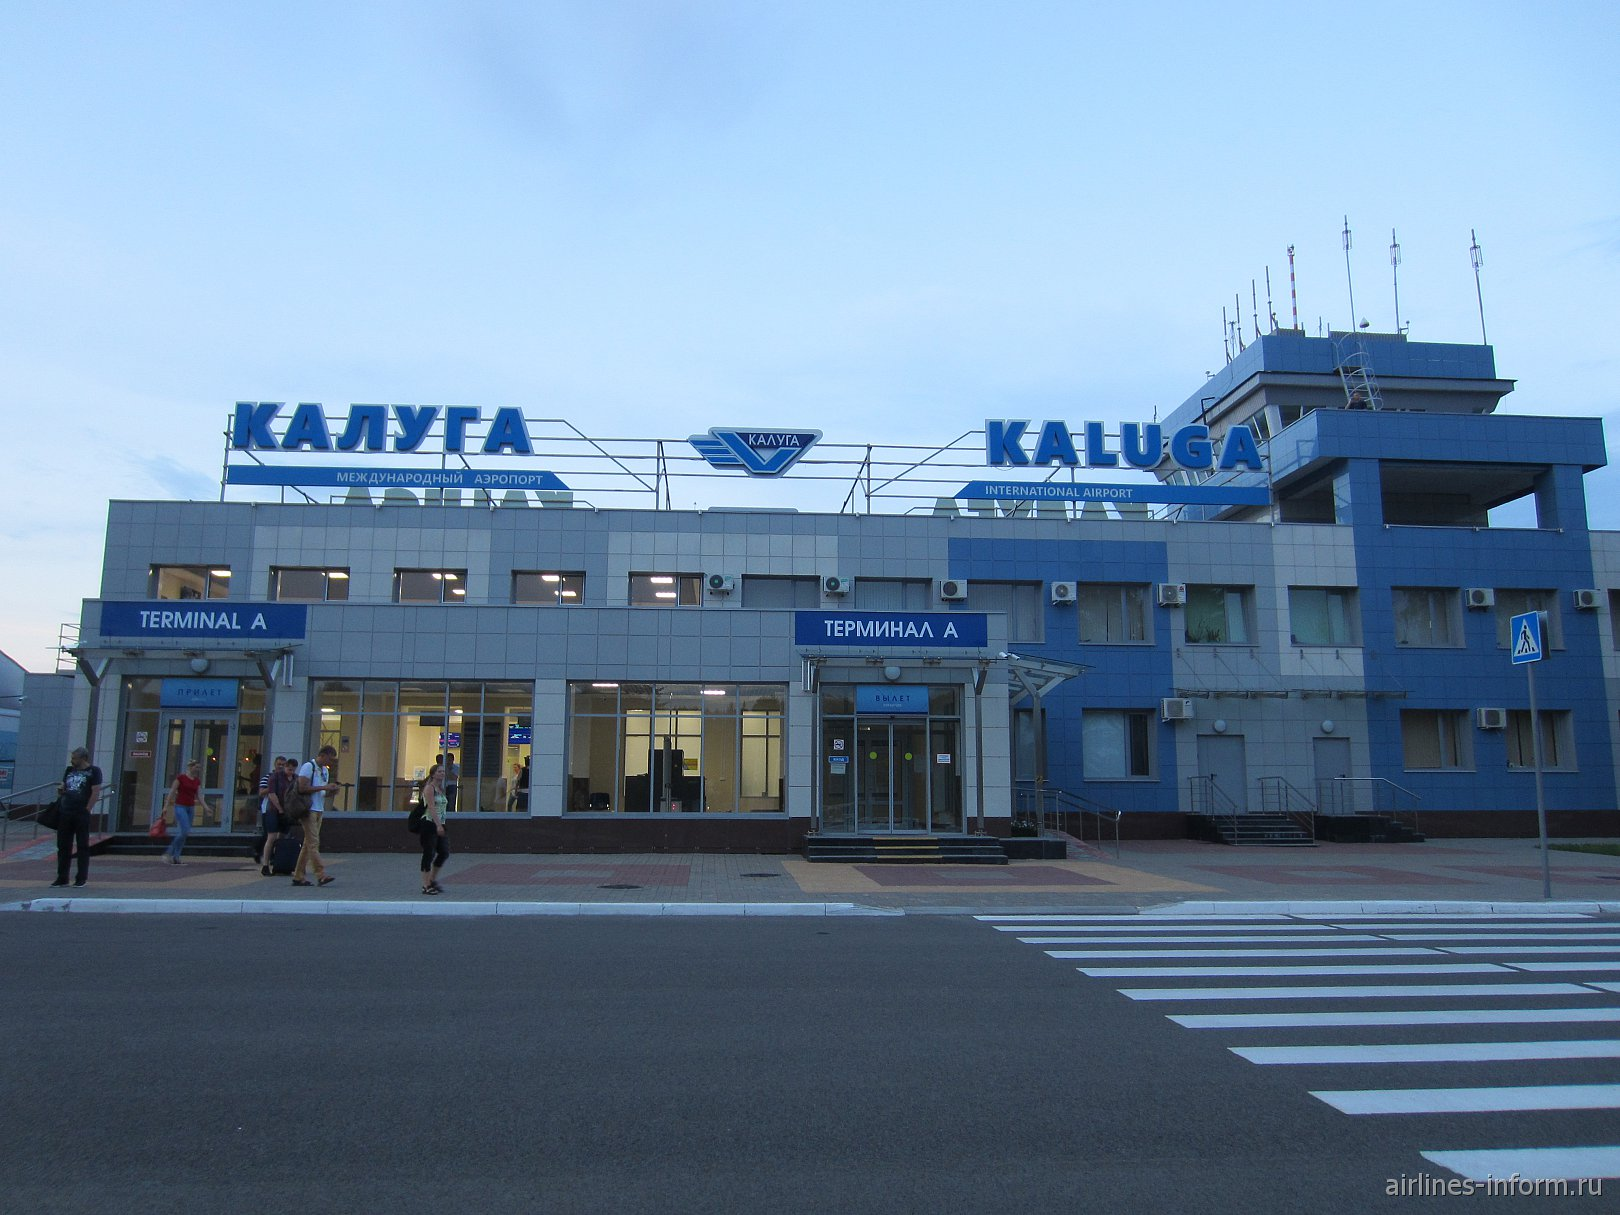 Аэровокзал аэропорта Калуга Грабцево